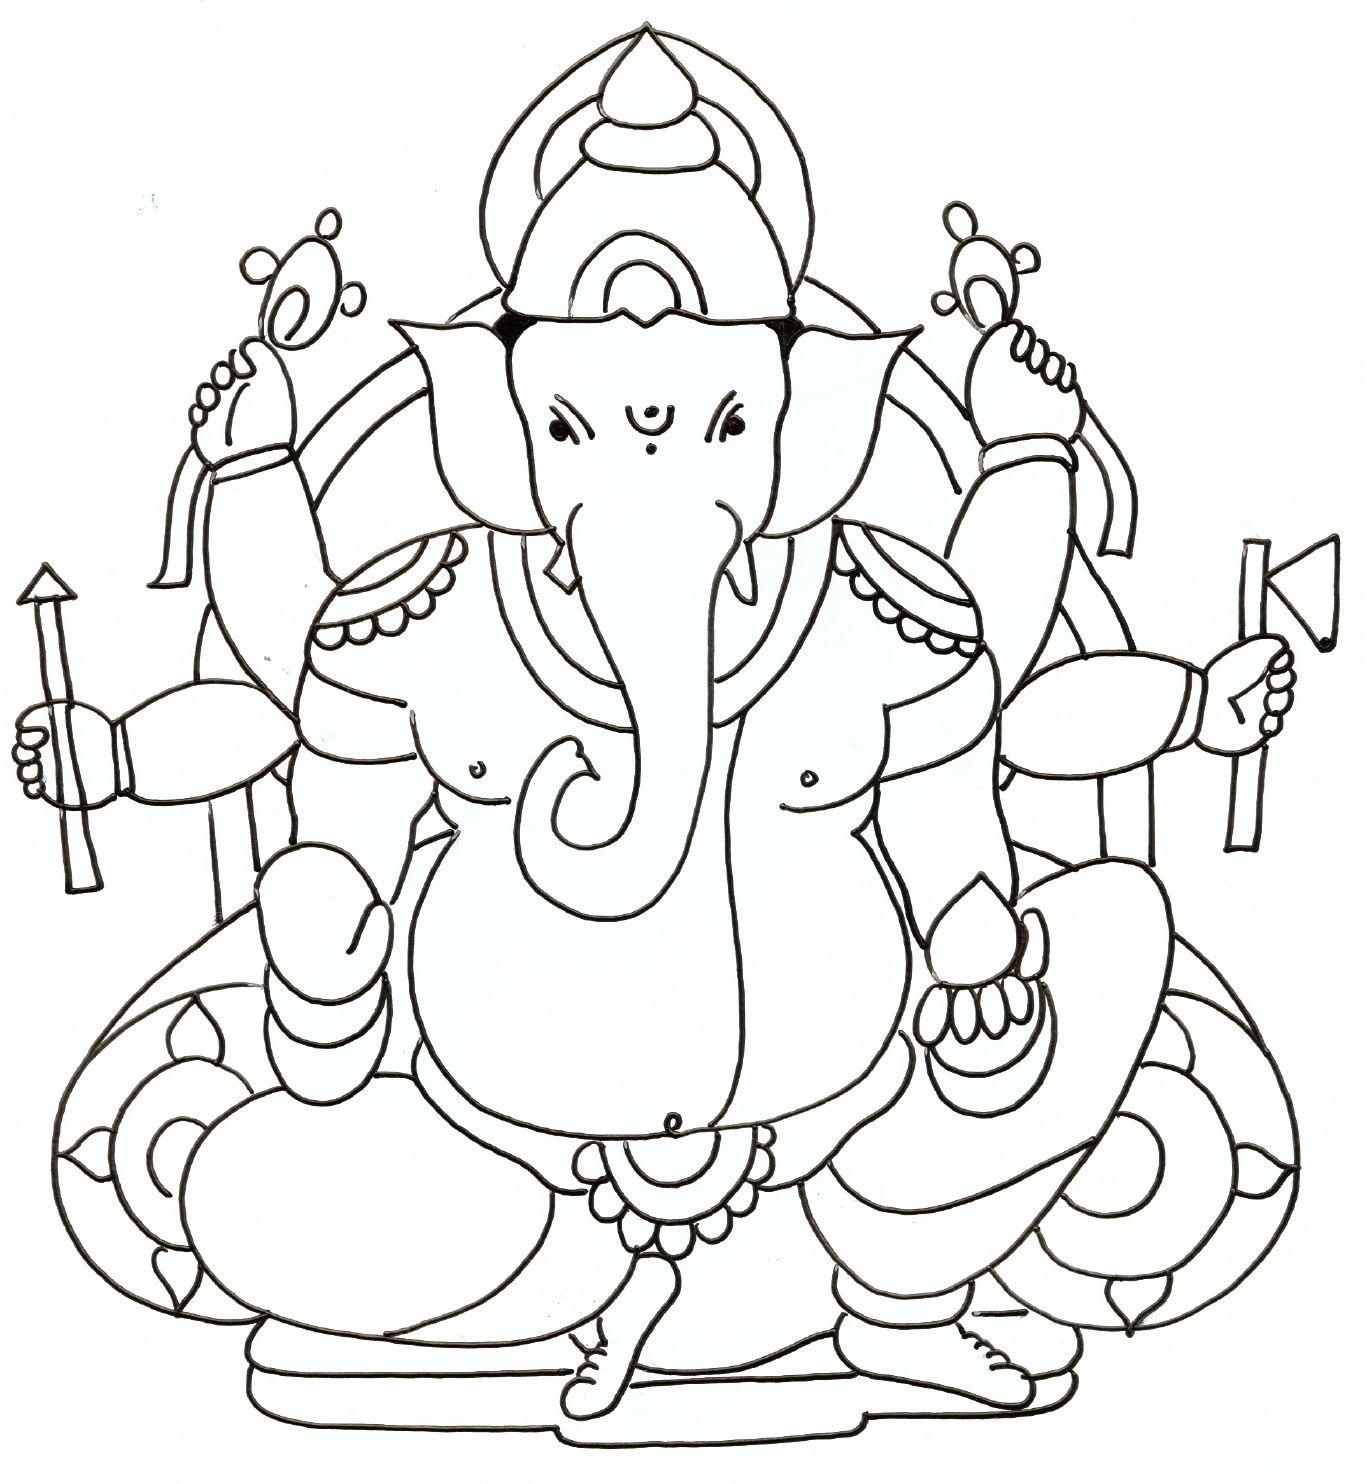 1367x1484 Ganesh Drawings For Kids Festivals Pencil Art